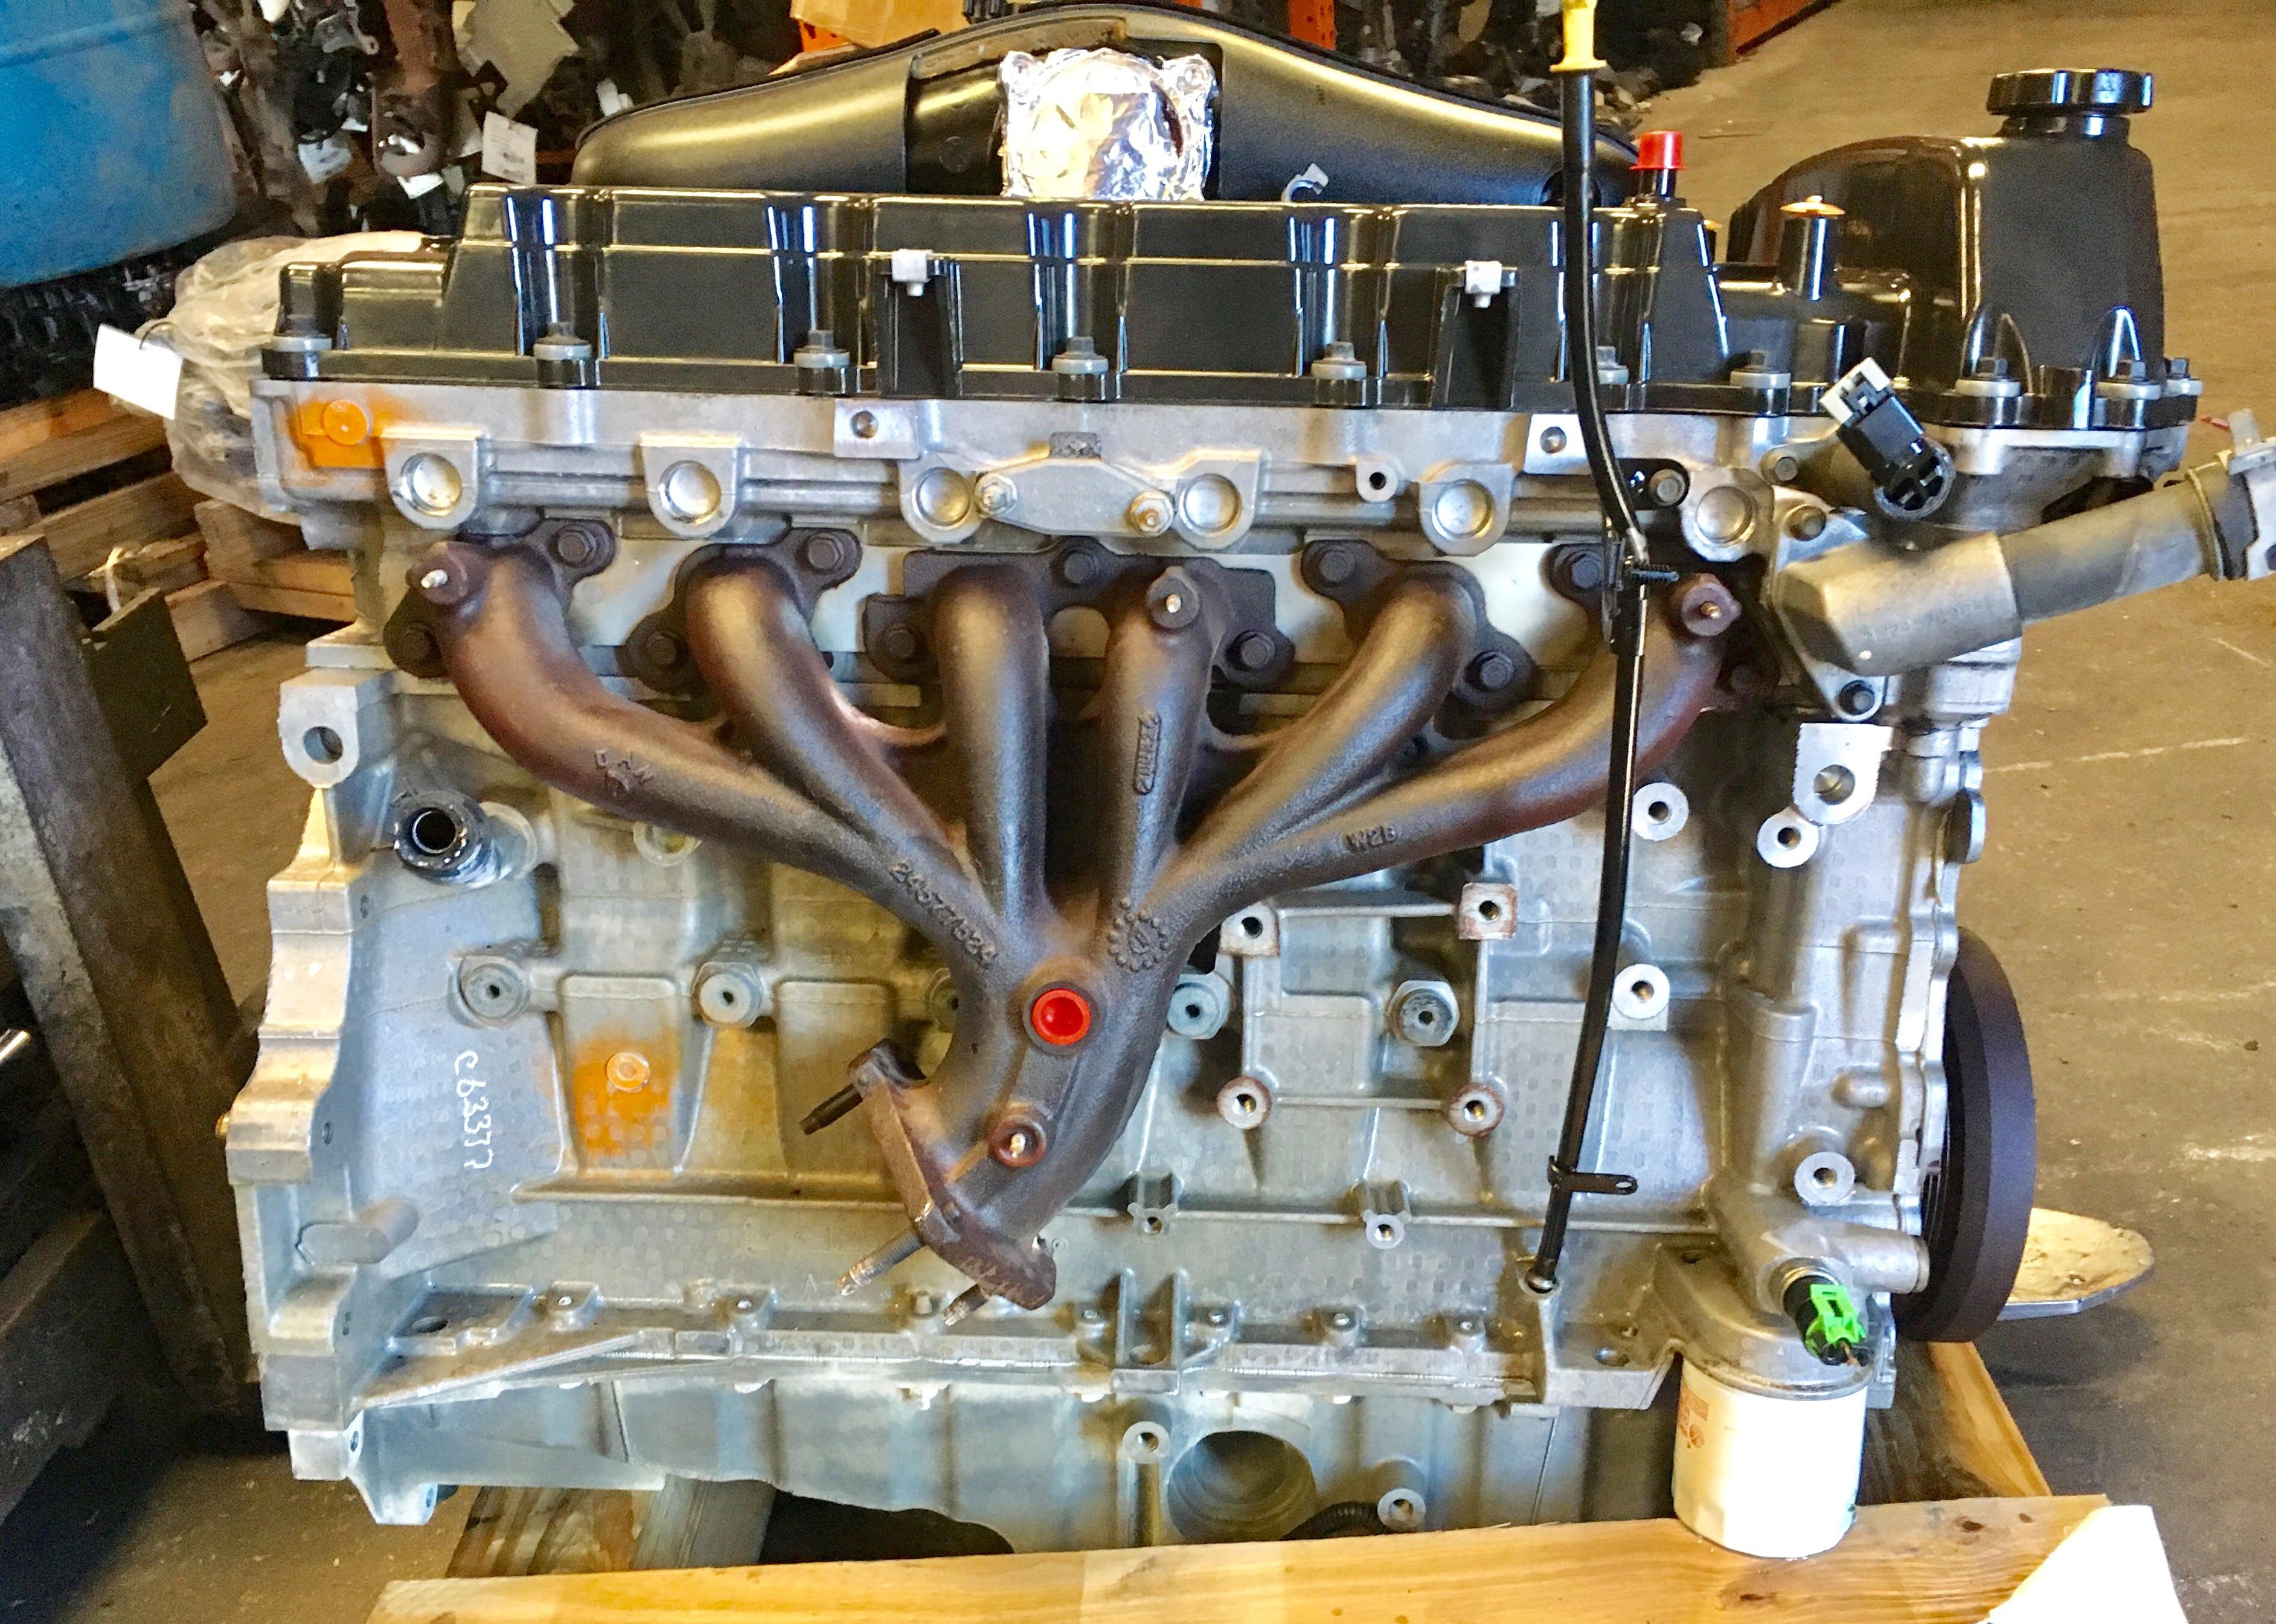 2006 Chevy Trailblazer Engine Diagram